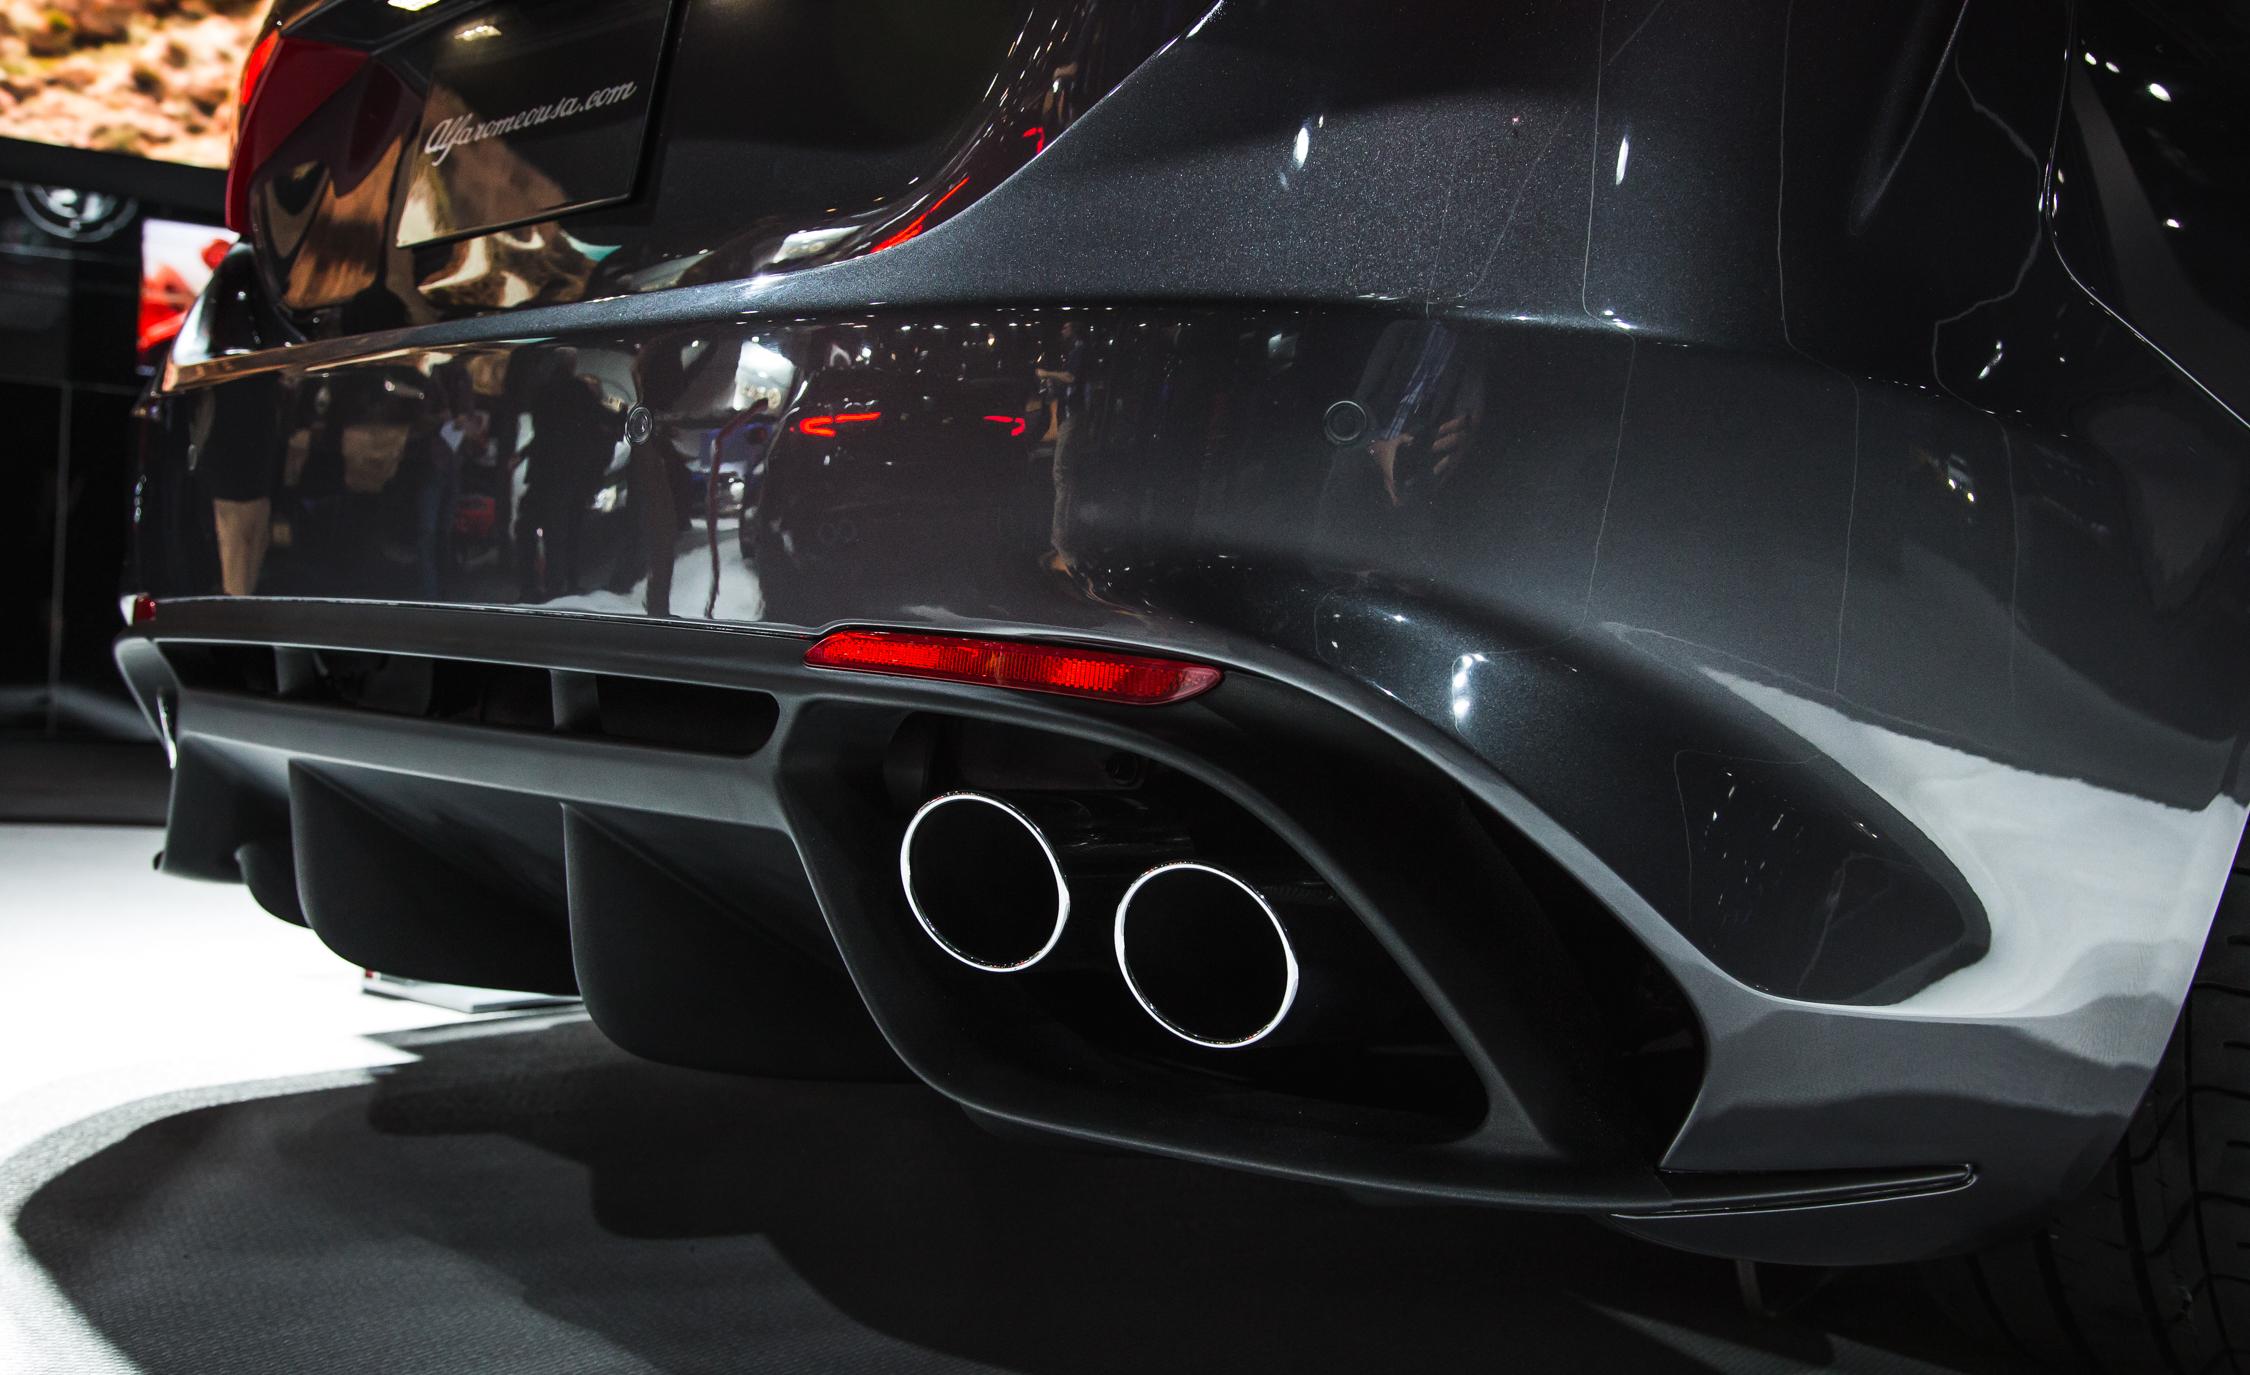 Exhaust Pipe 2017 Alfa Romeo Giulia Quadrifoglio